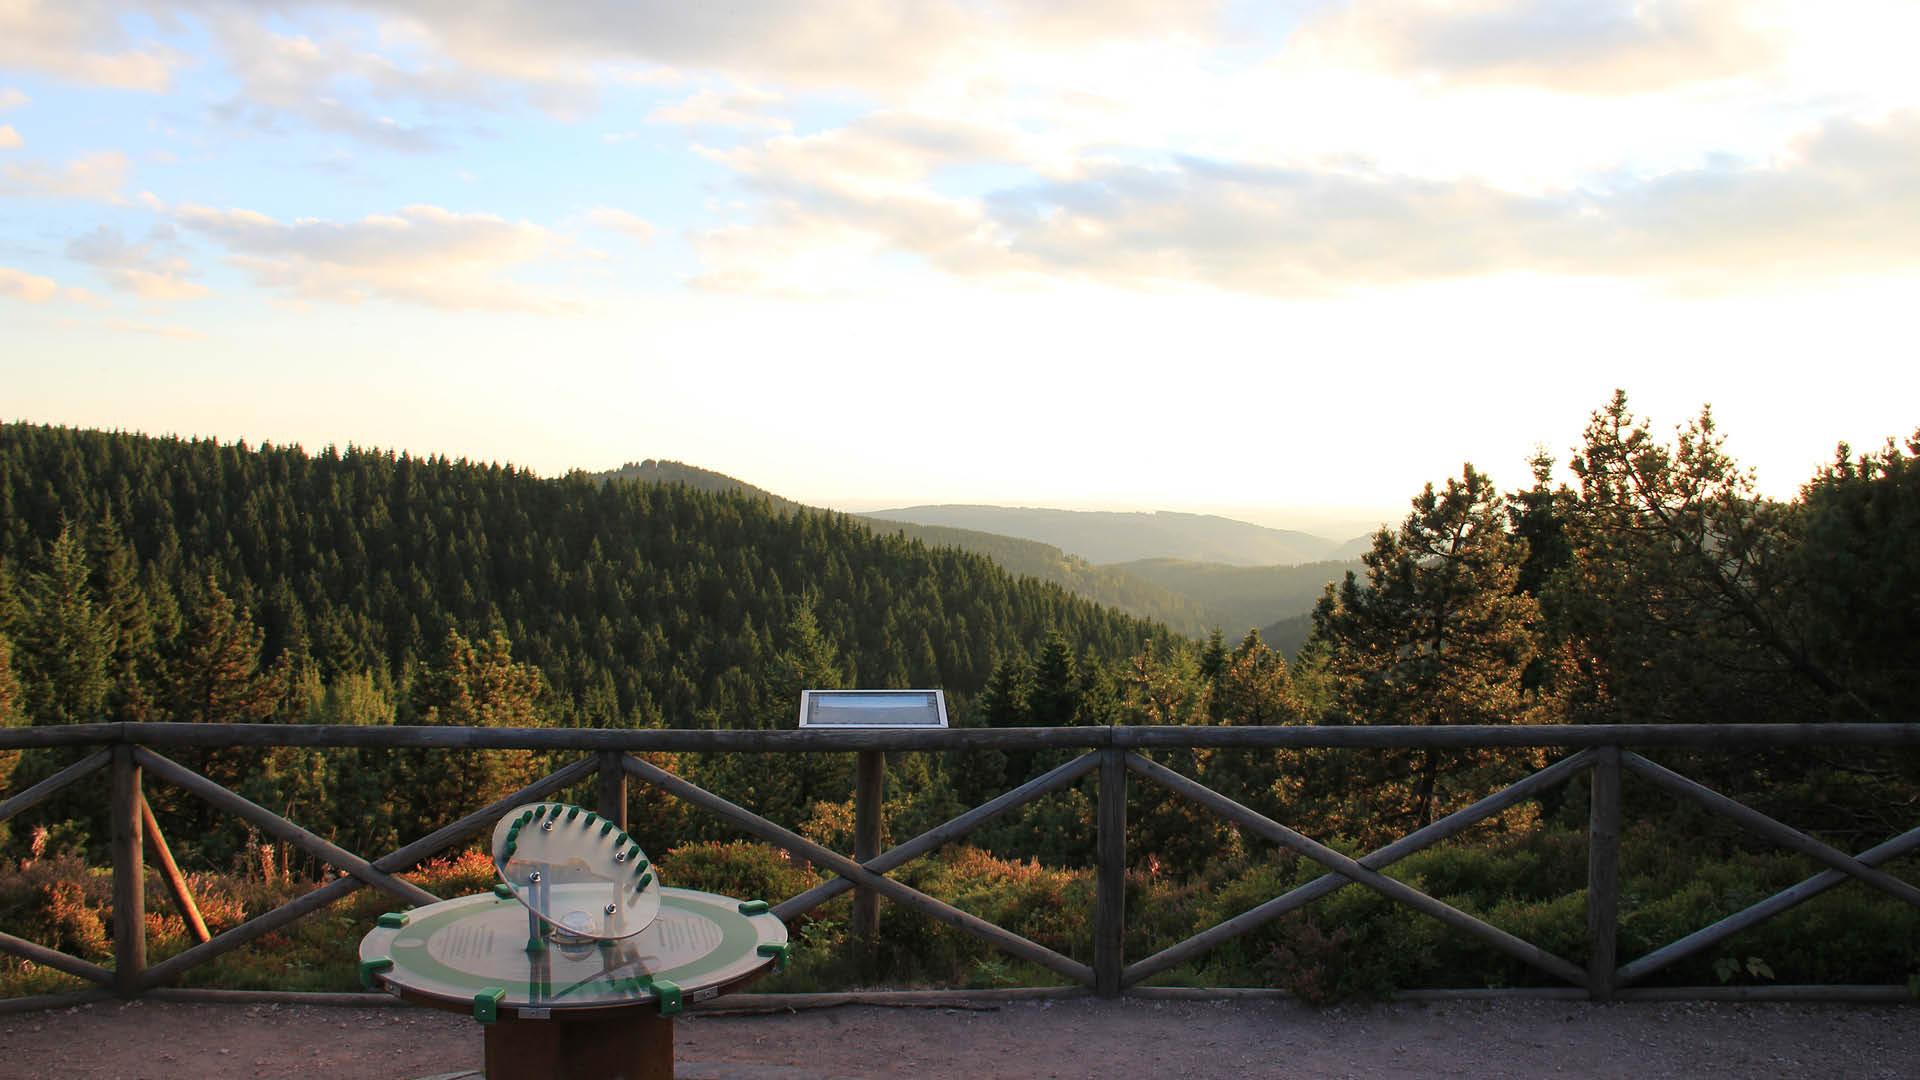 Rennsteiggarten Oberhof Blick über den Thüringer Wald